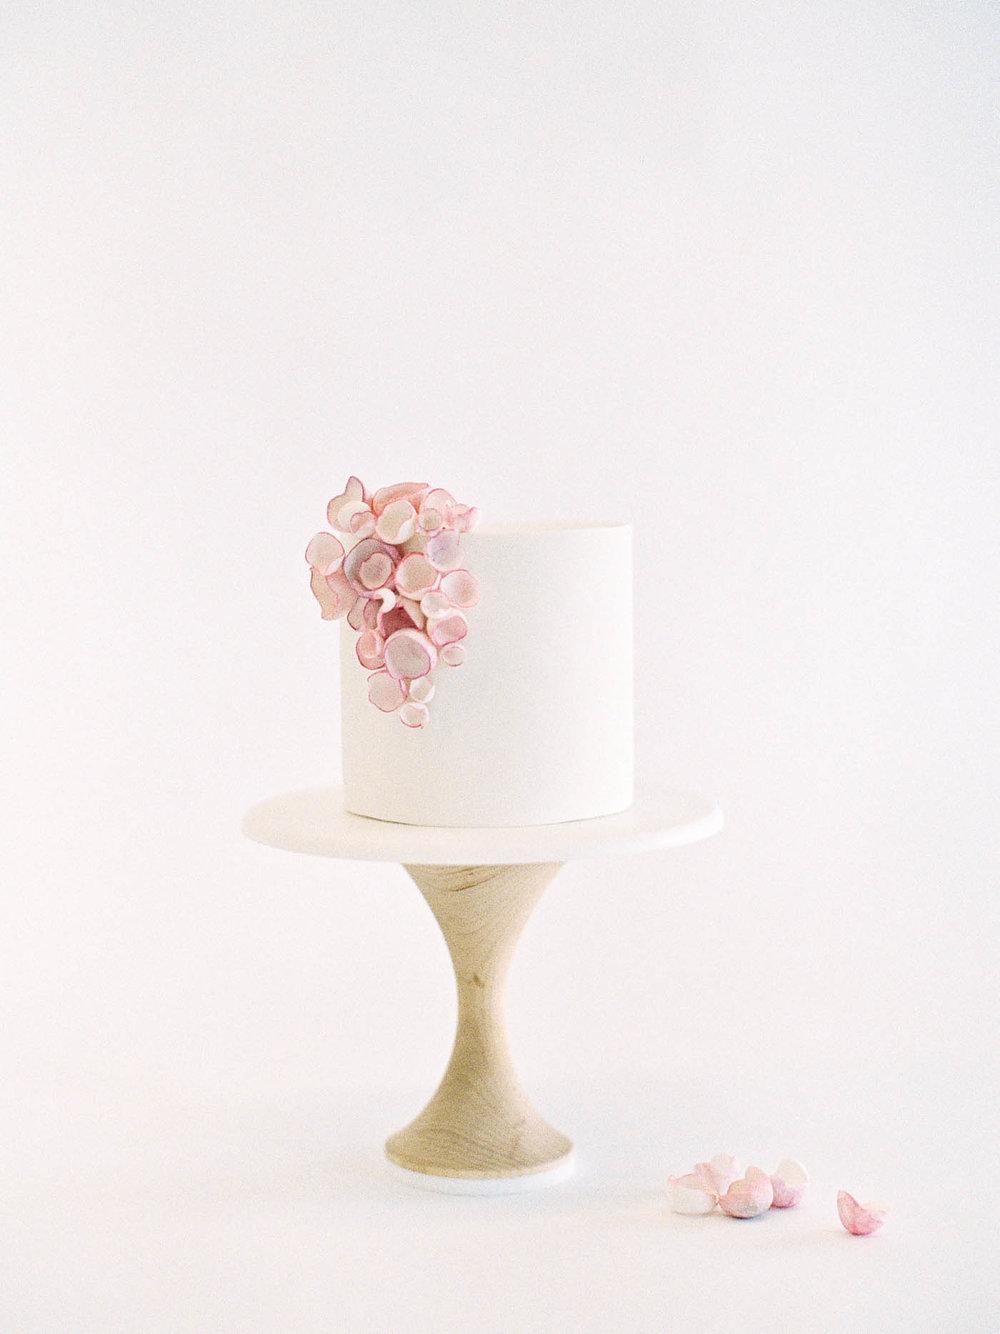 Delicate-Wedding-Cakes-1-Jen_Huang-002344-R1-011.jpg